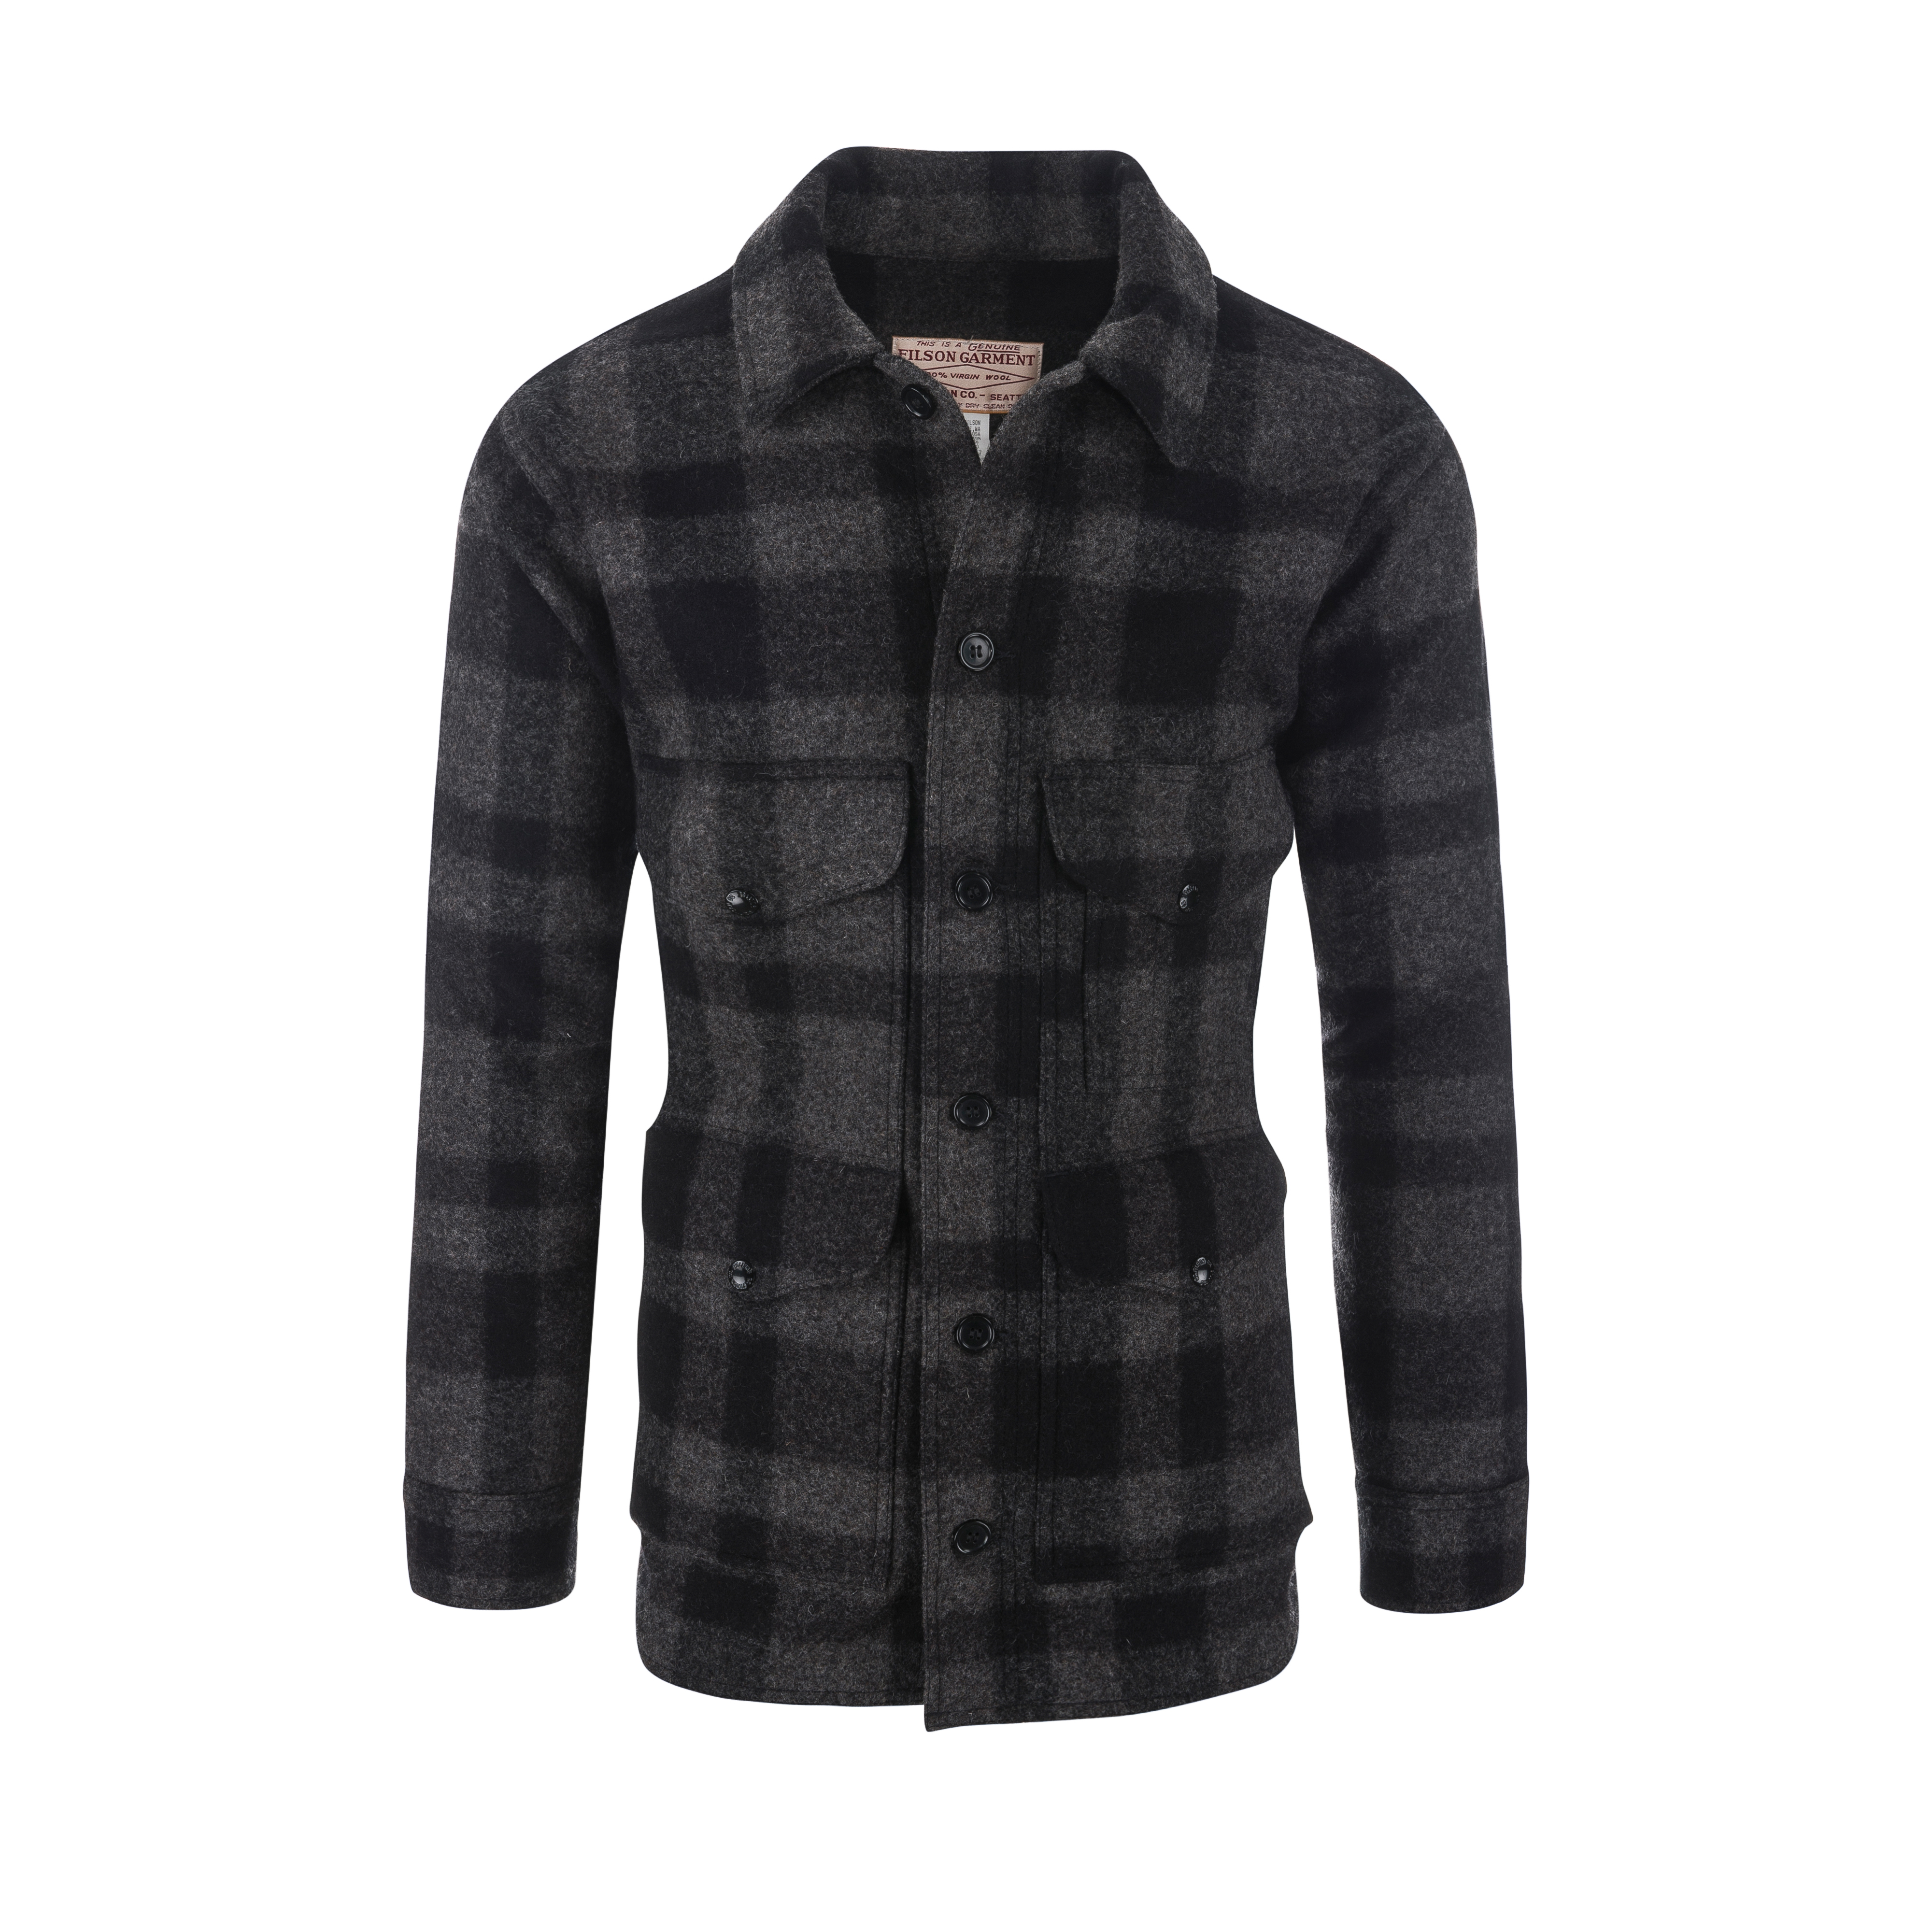 Wool Mackinaw Cruiser Jacket Grey/Black